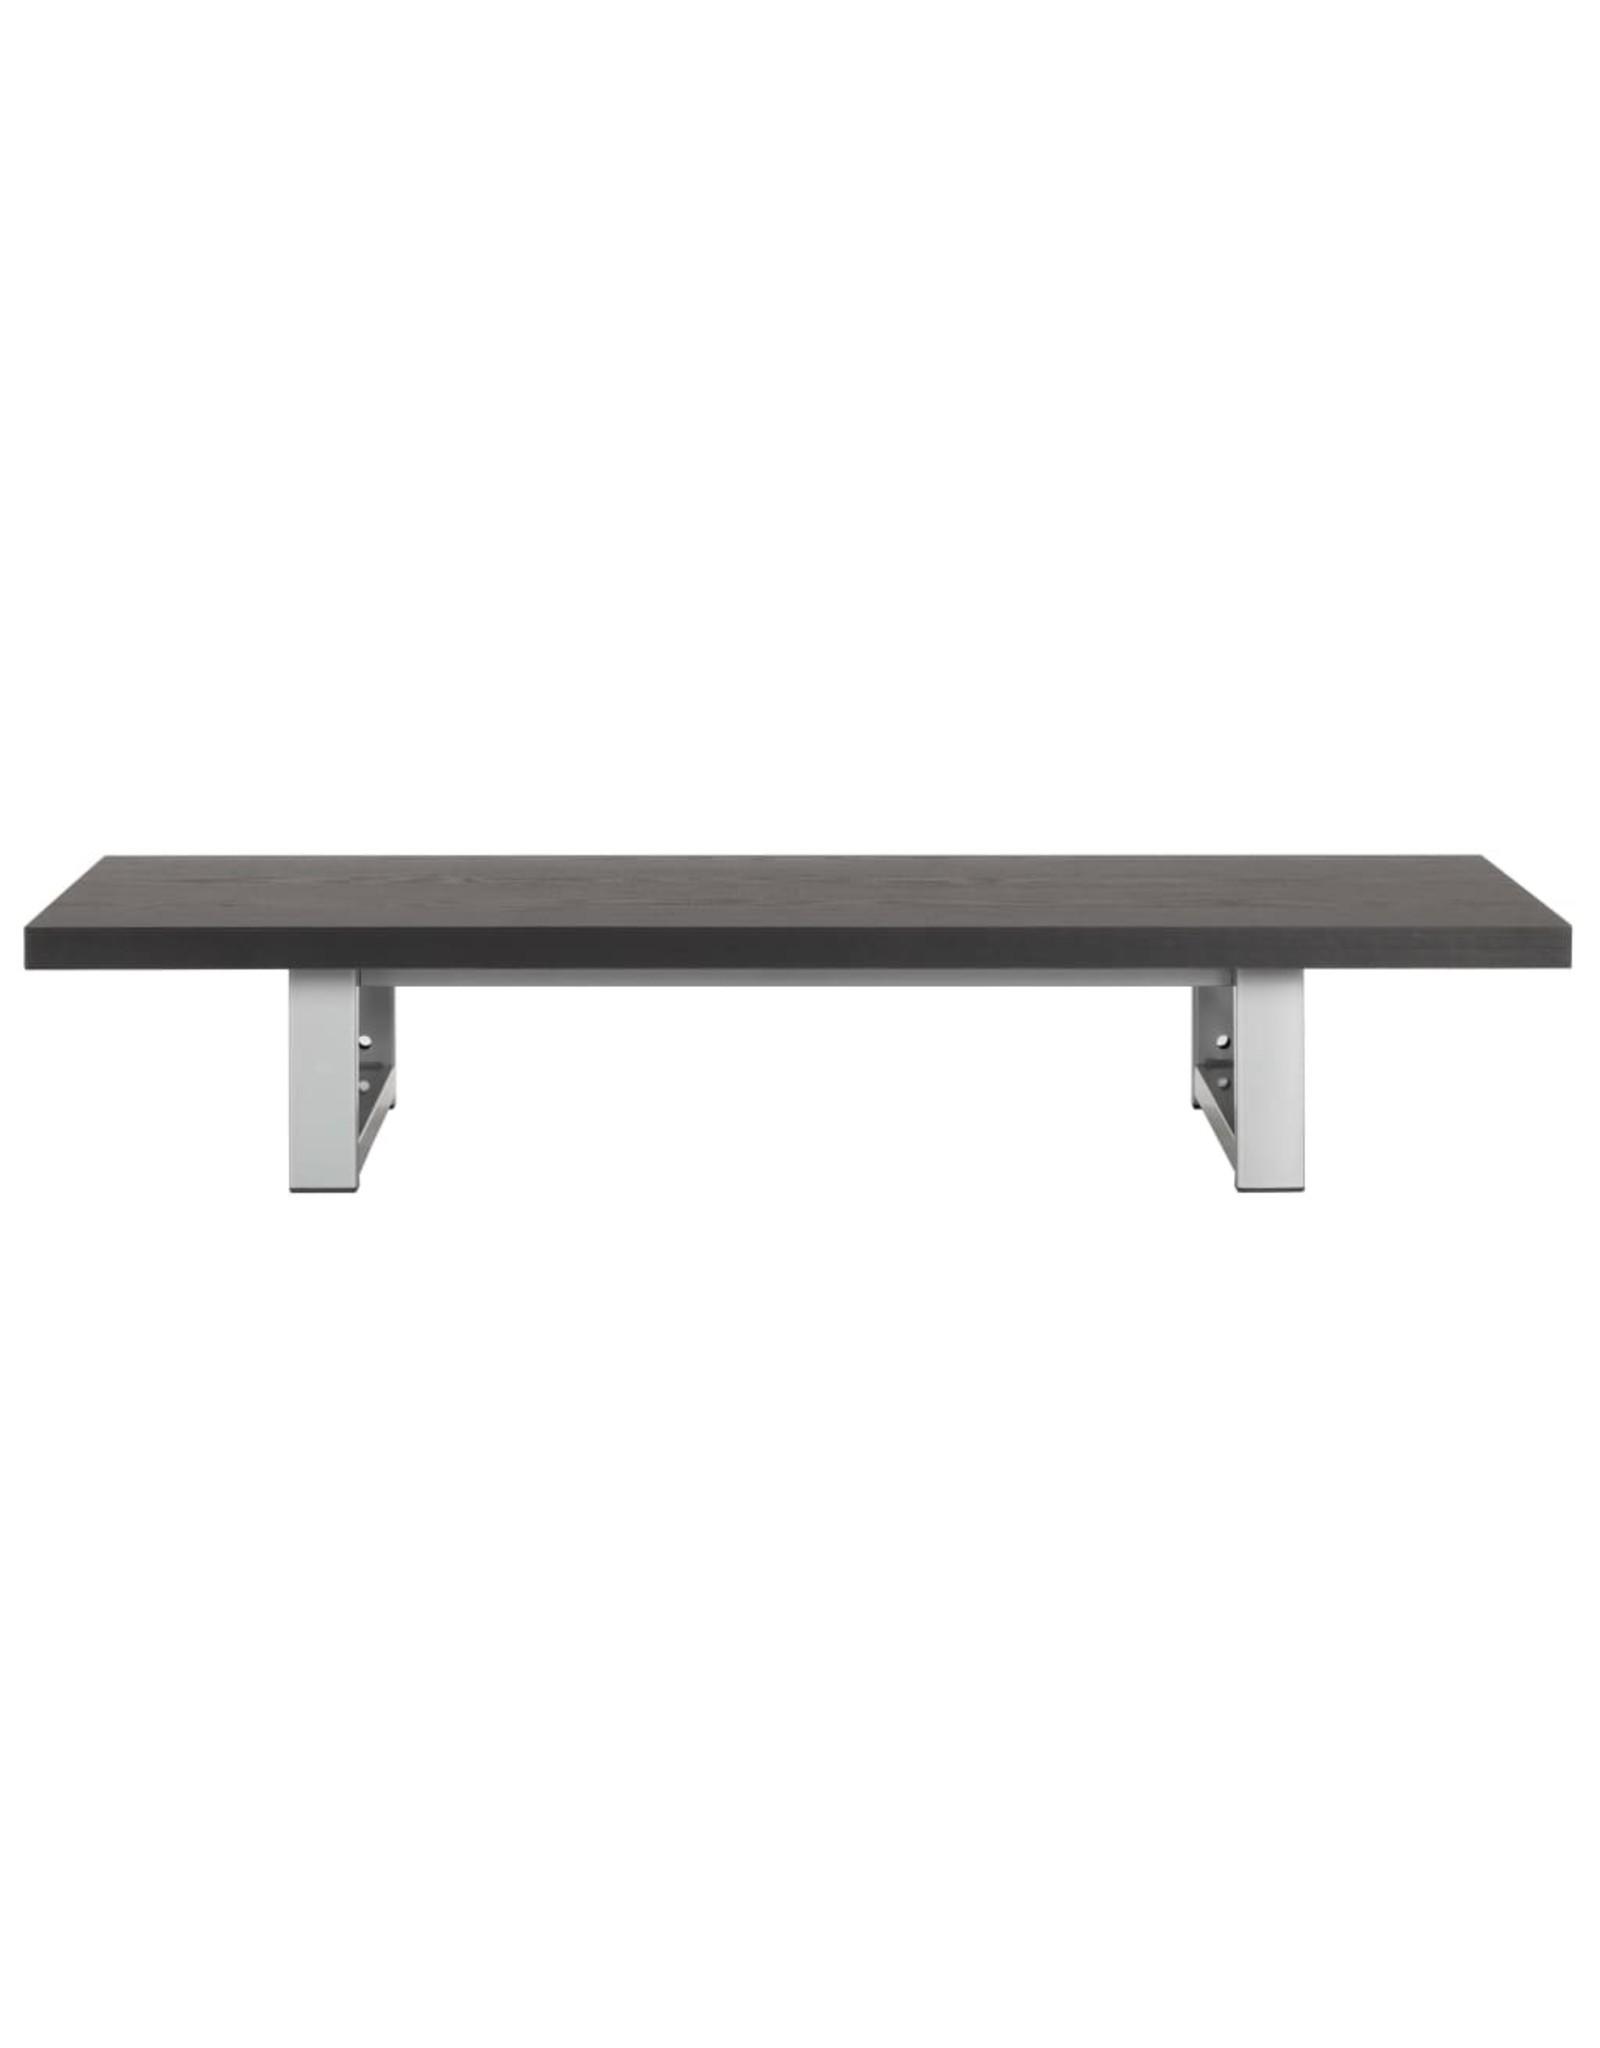 Badkamermeubel 90x40x16,3 cm zwart